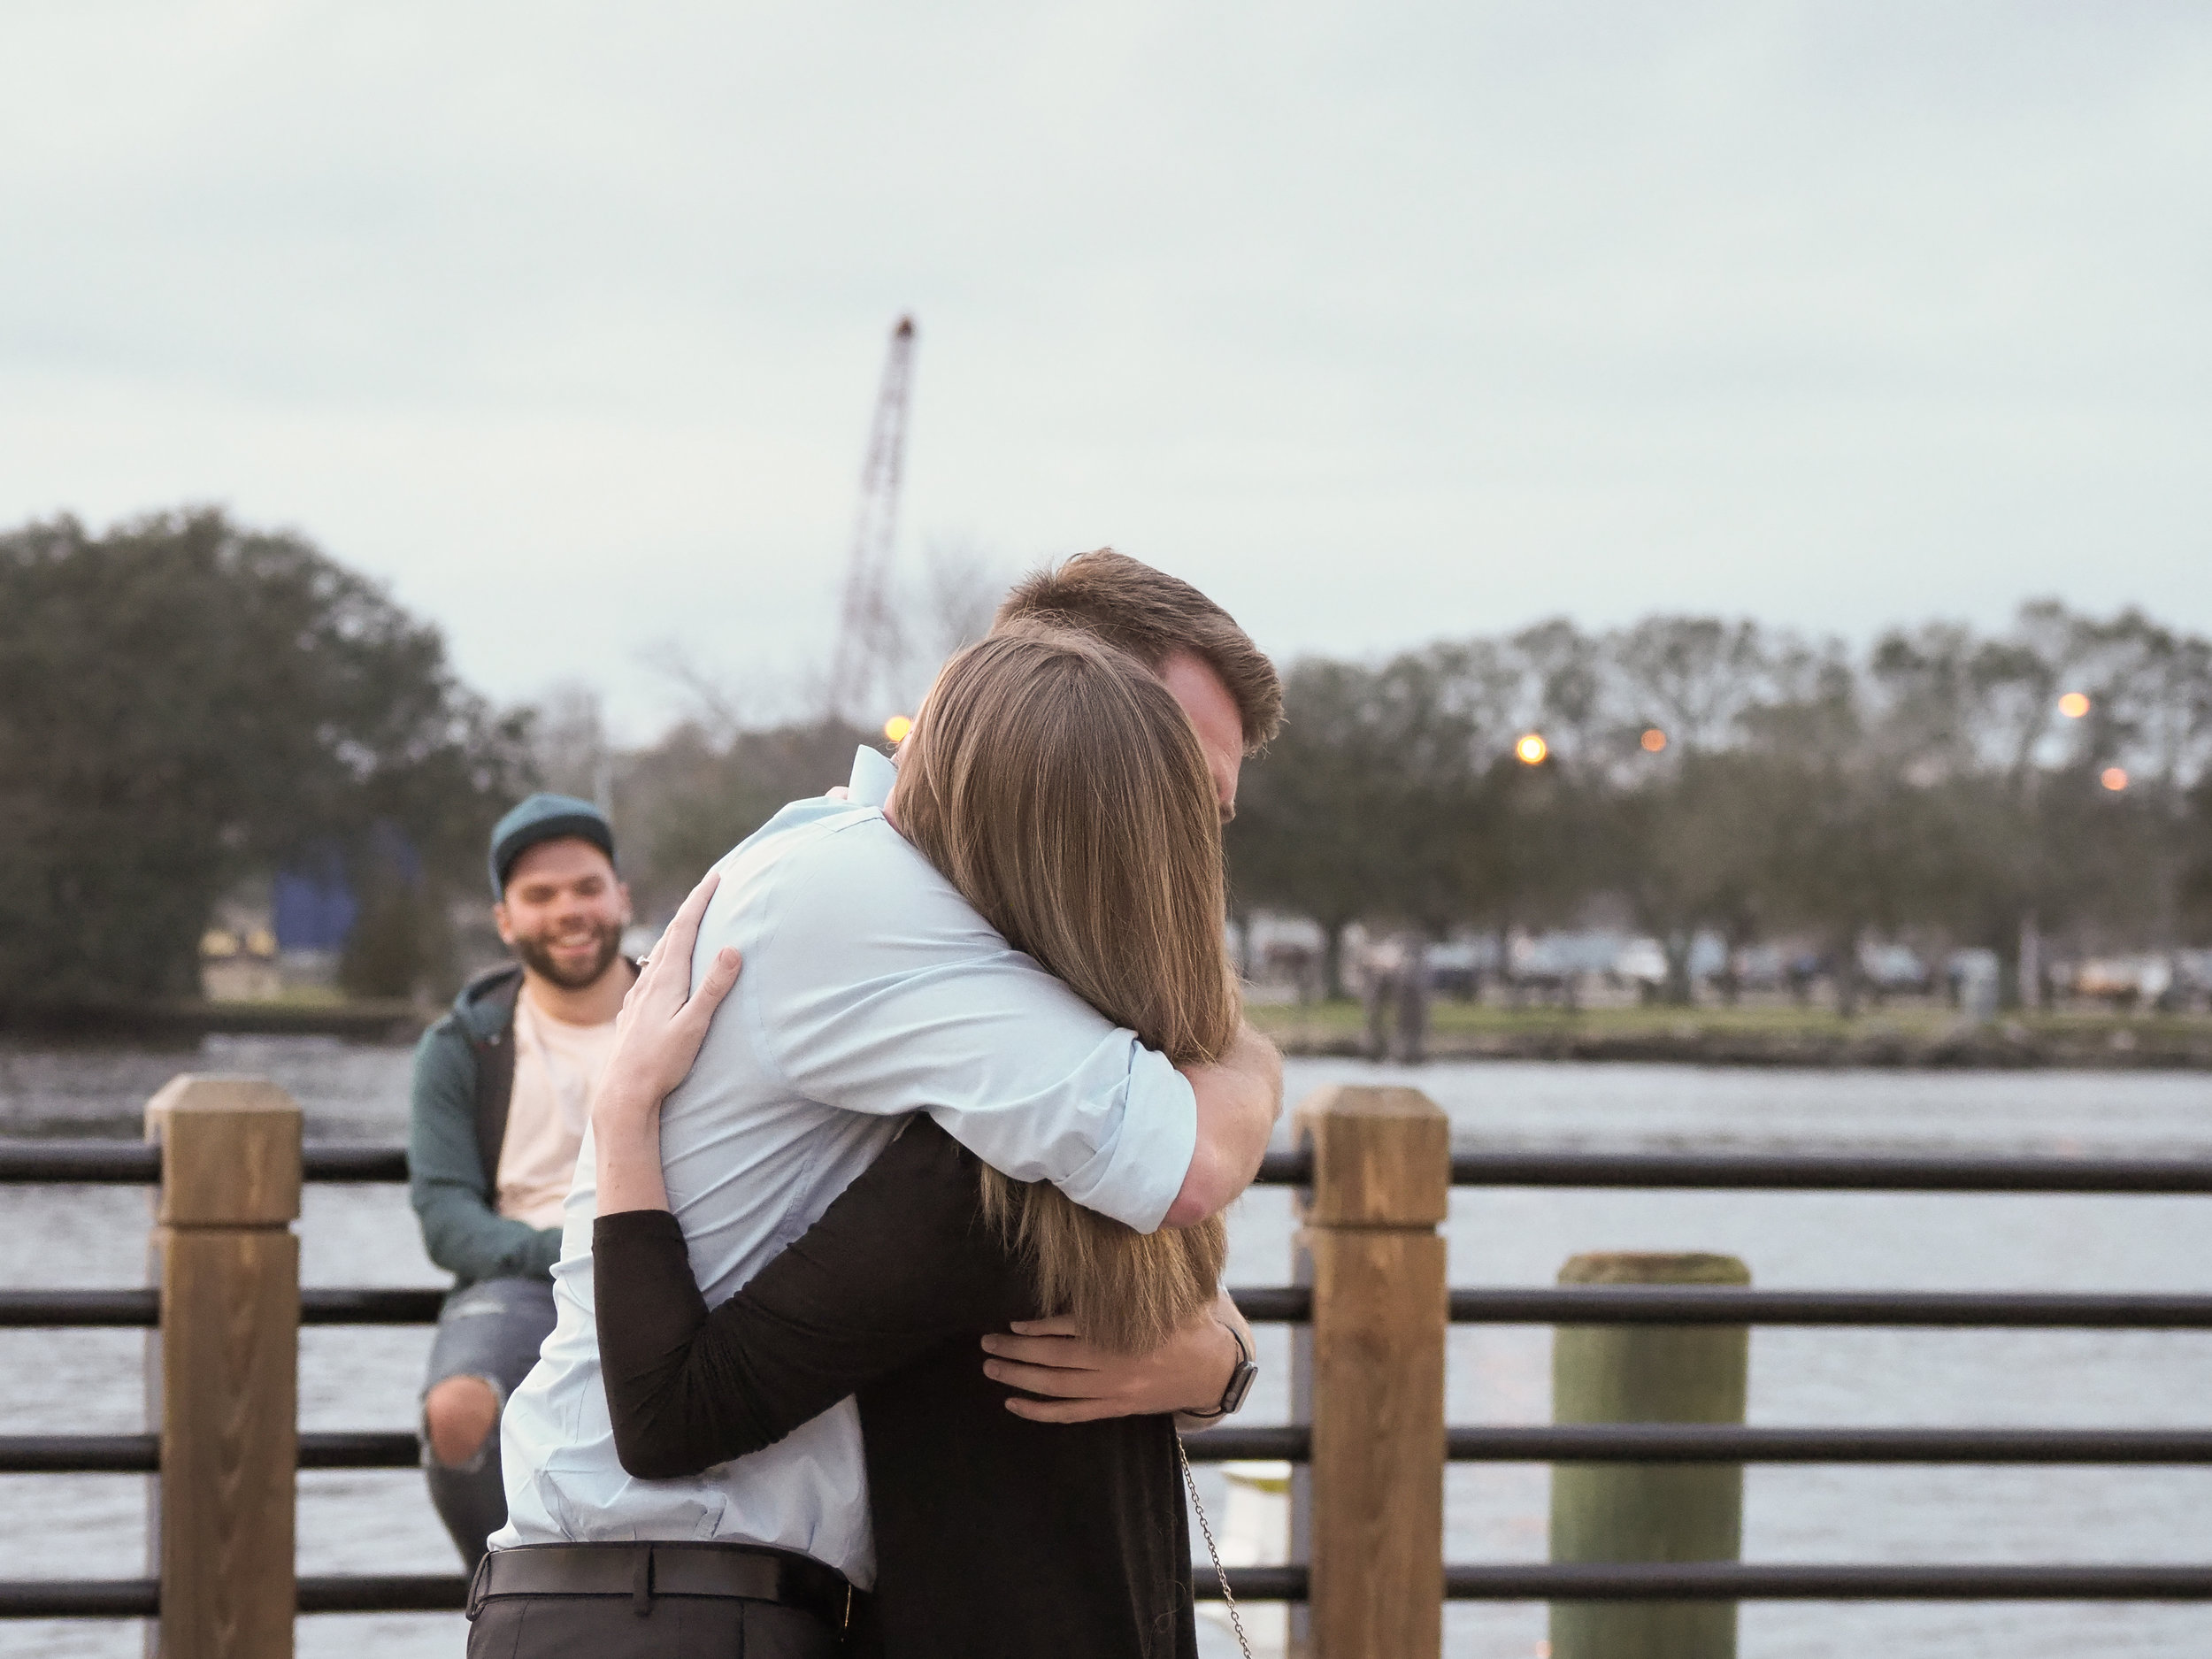 Hug. - Shear joy, as they realized that a wedding was in their future.